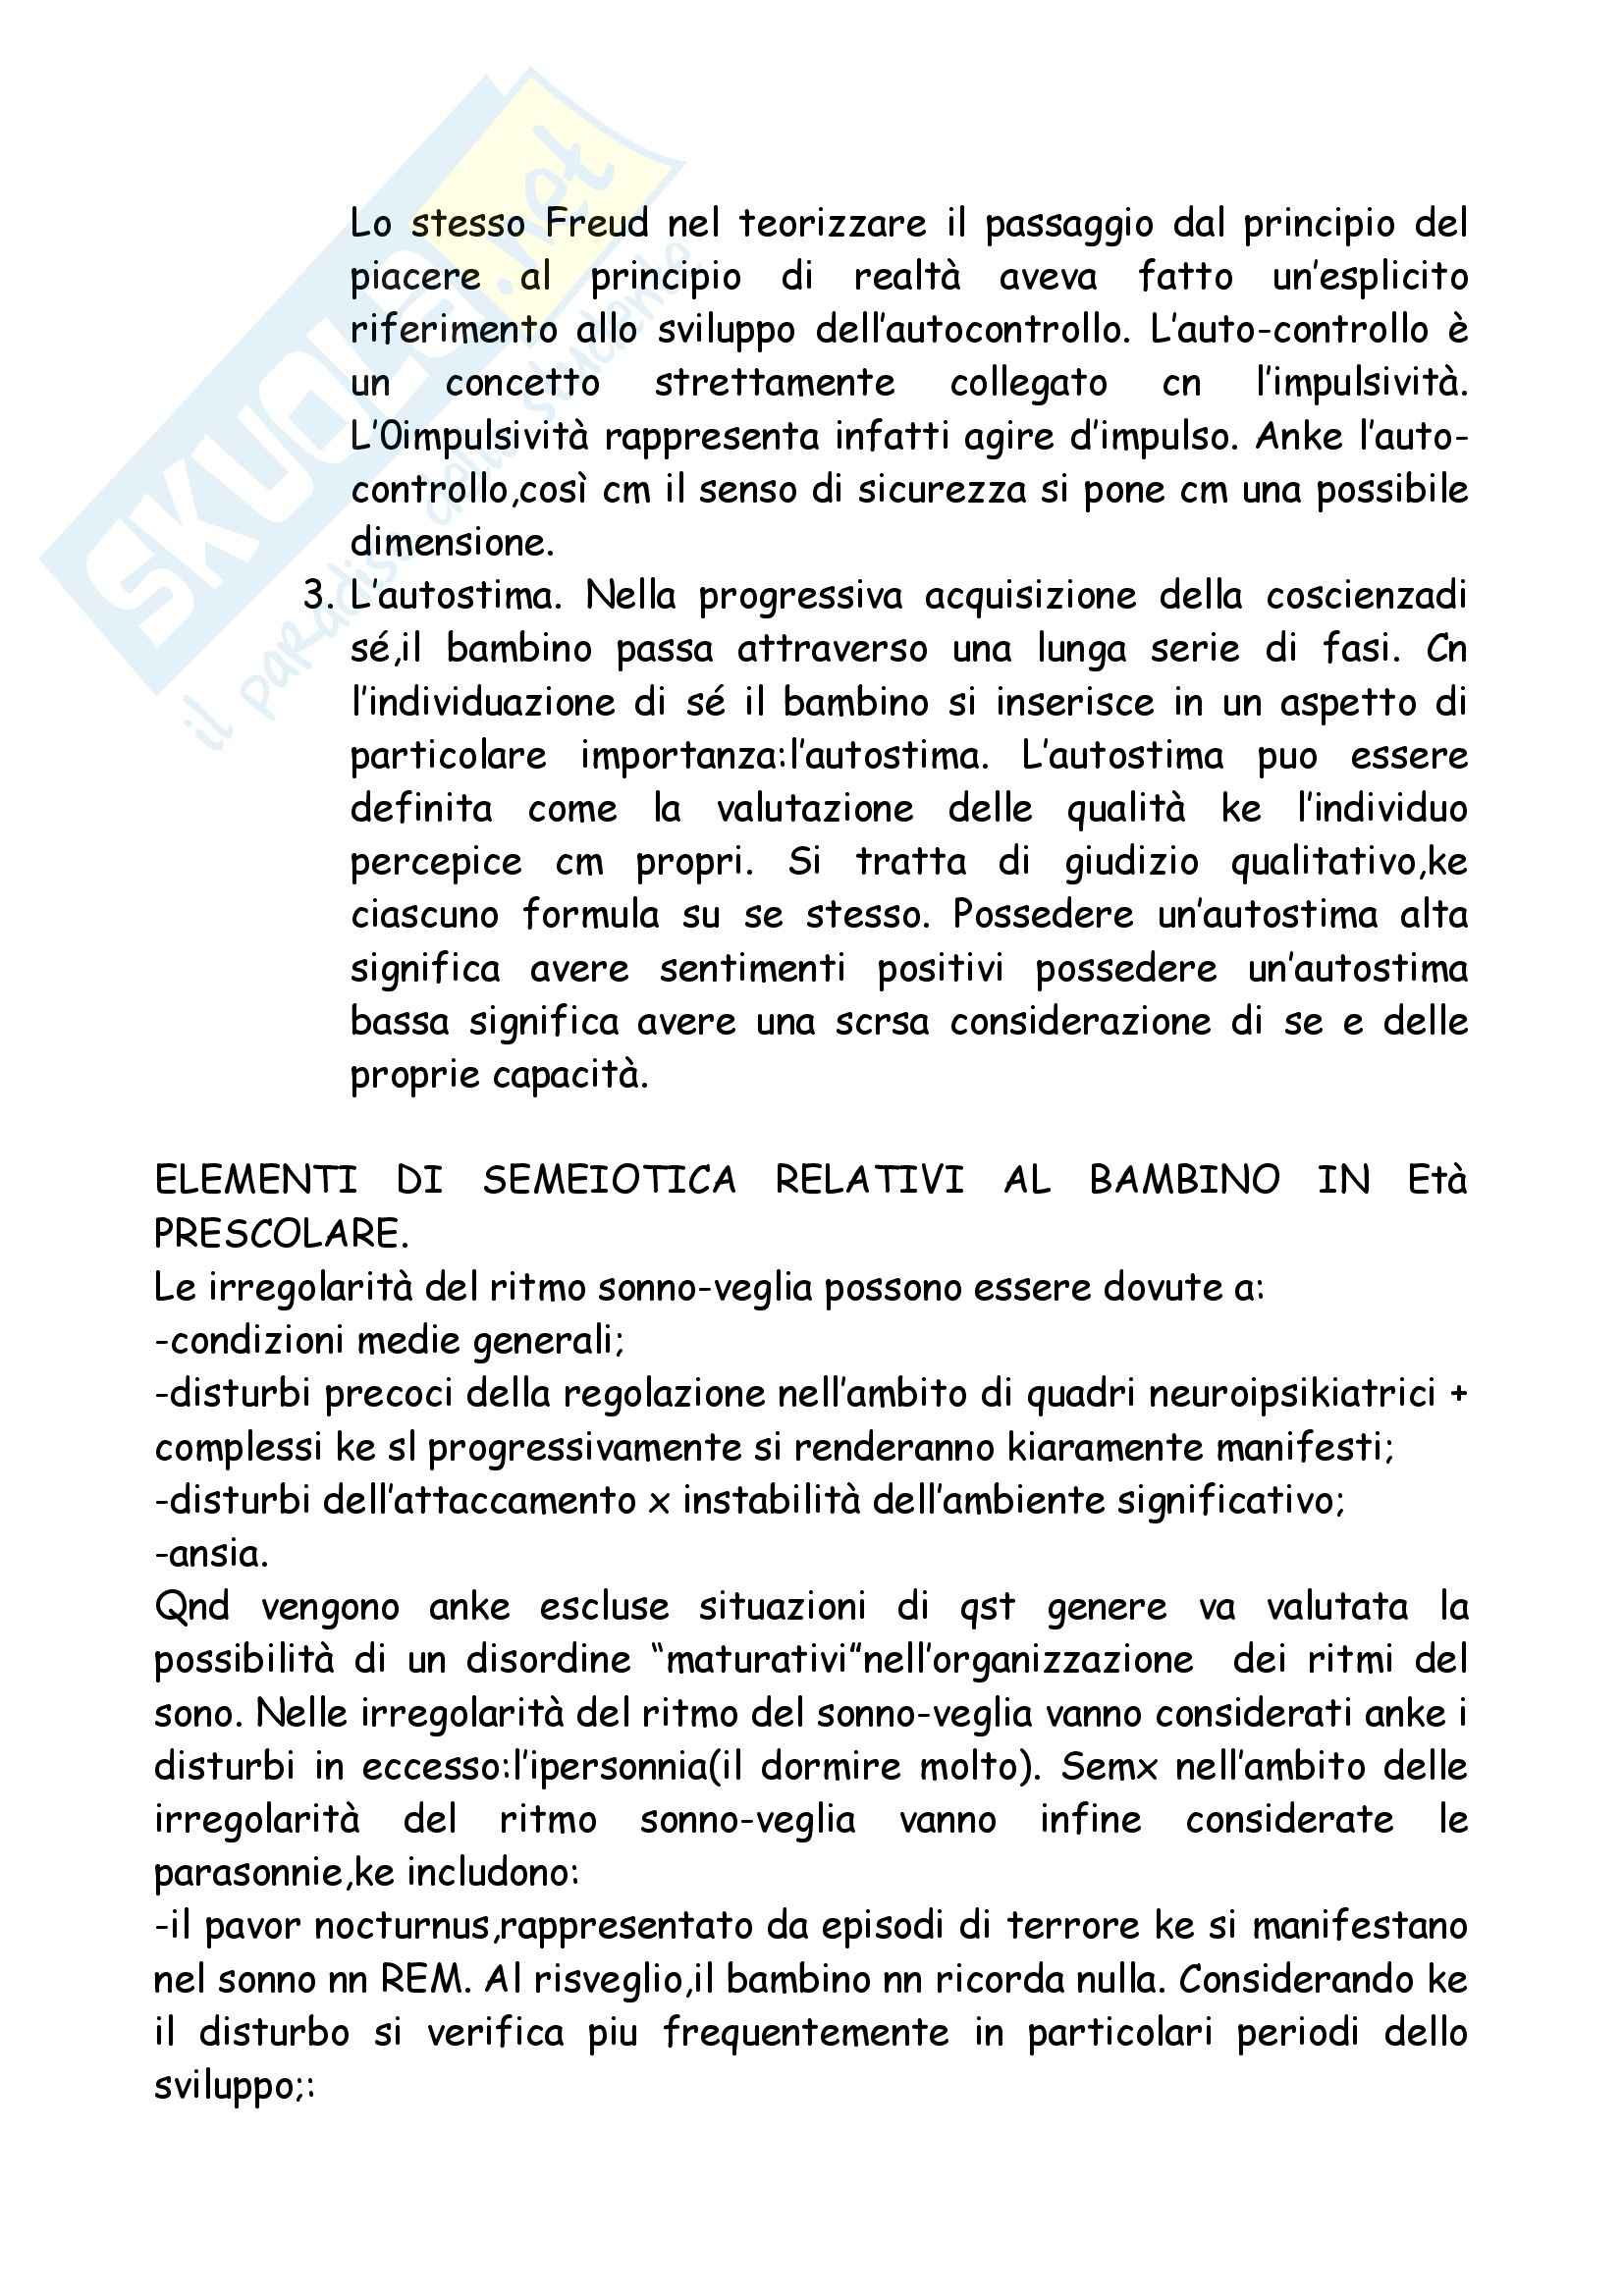 Neuropsichiatria Infantile Pag. 41